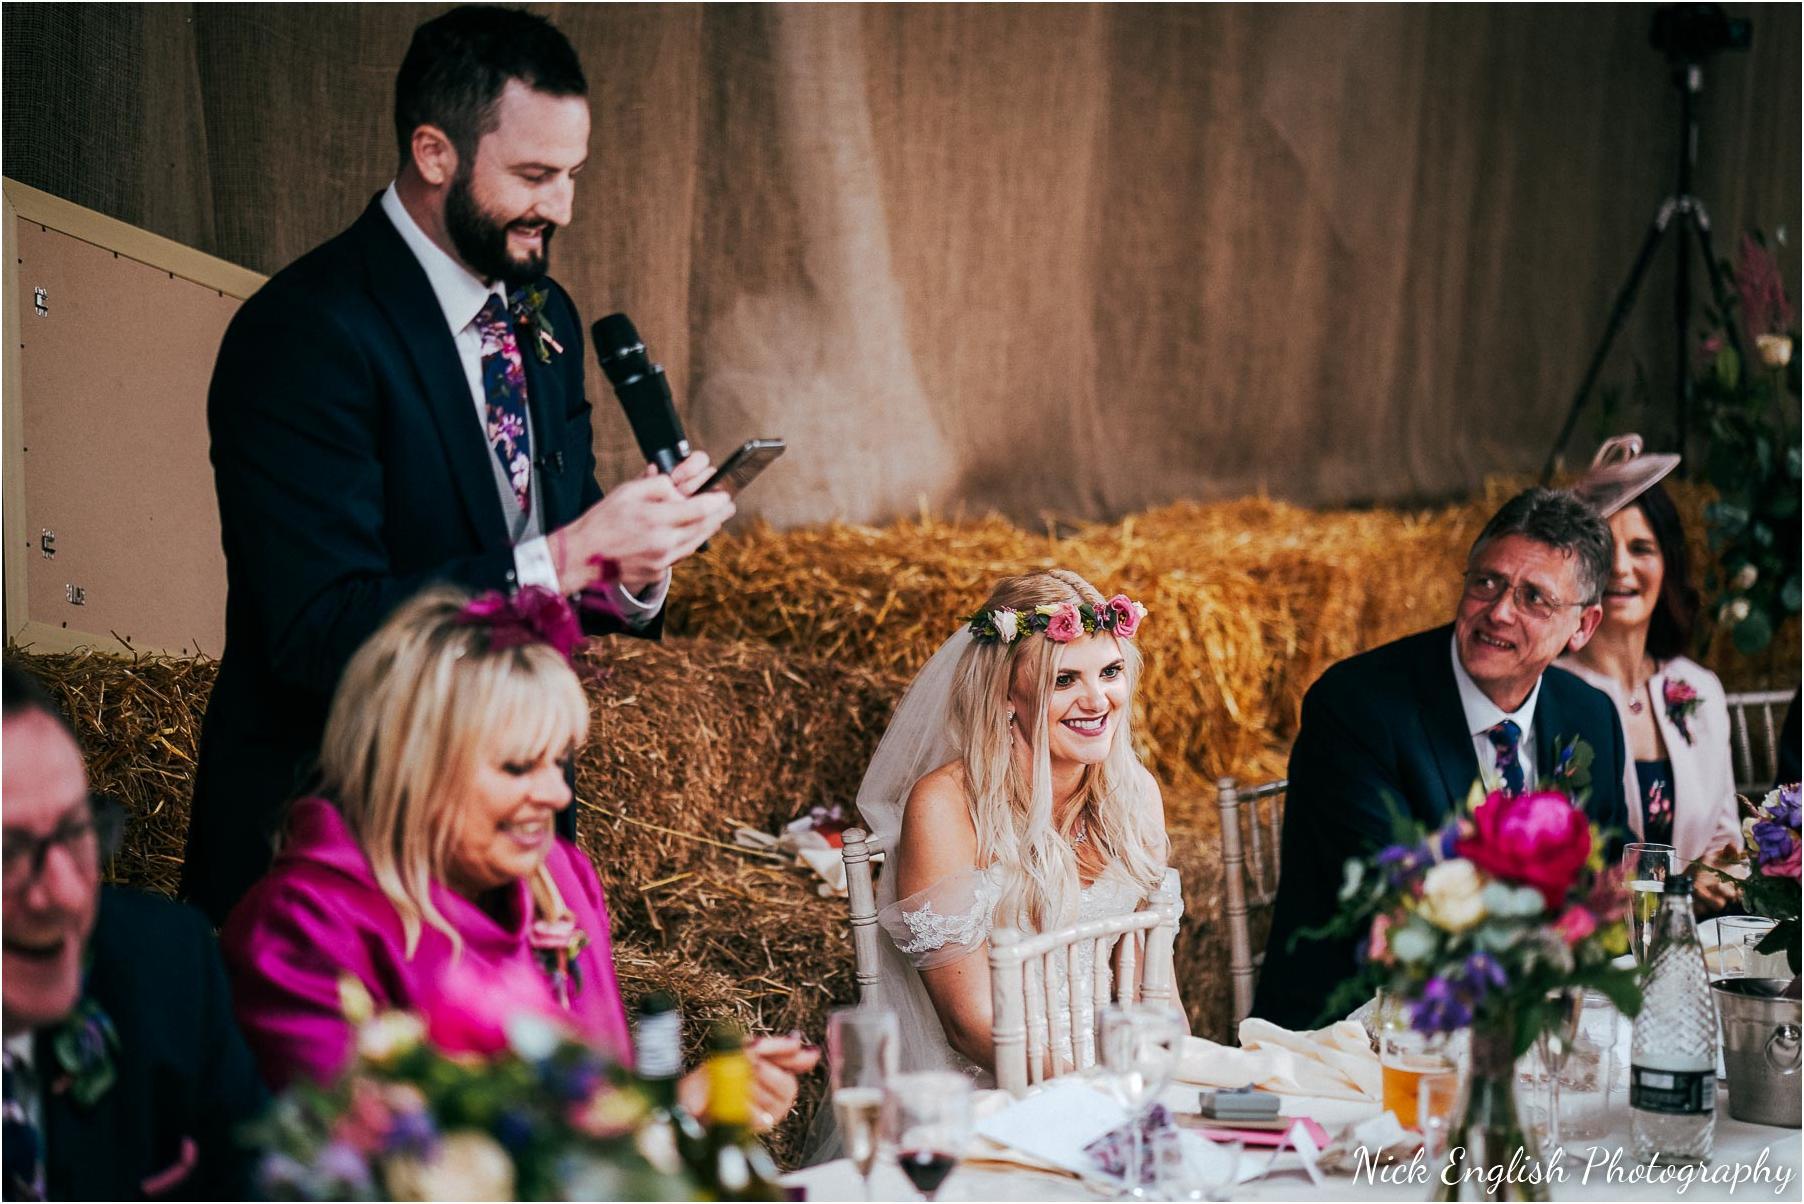 Whitebottom_Farm_Wedding_Manchester_Photograph-77.jpg